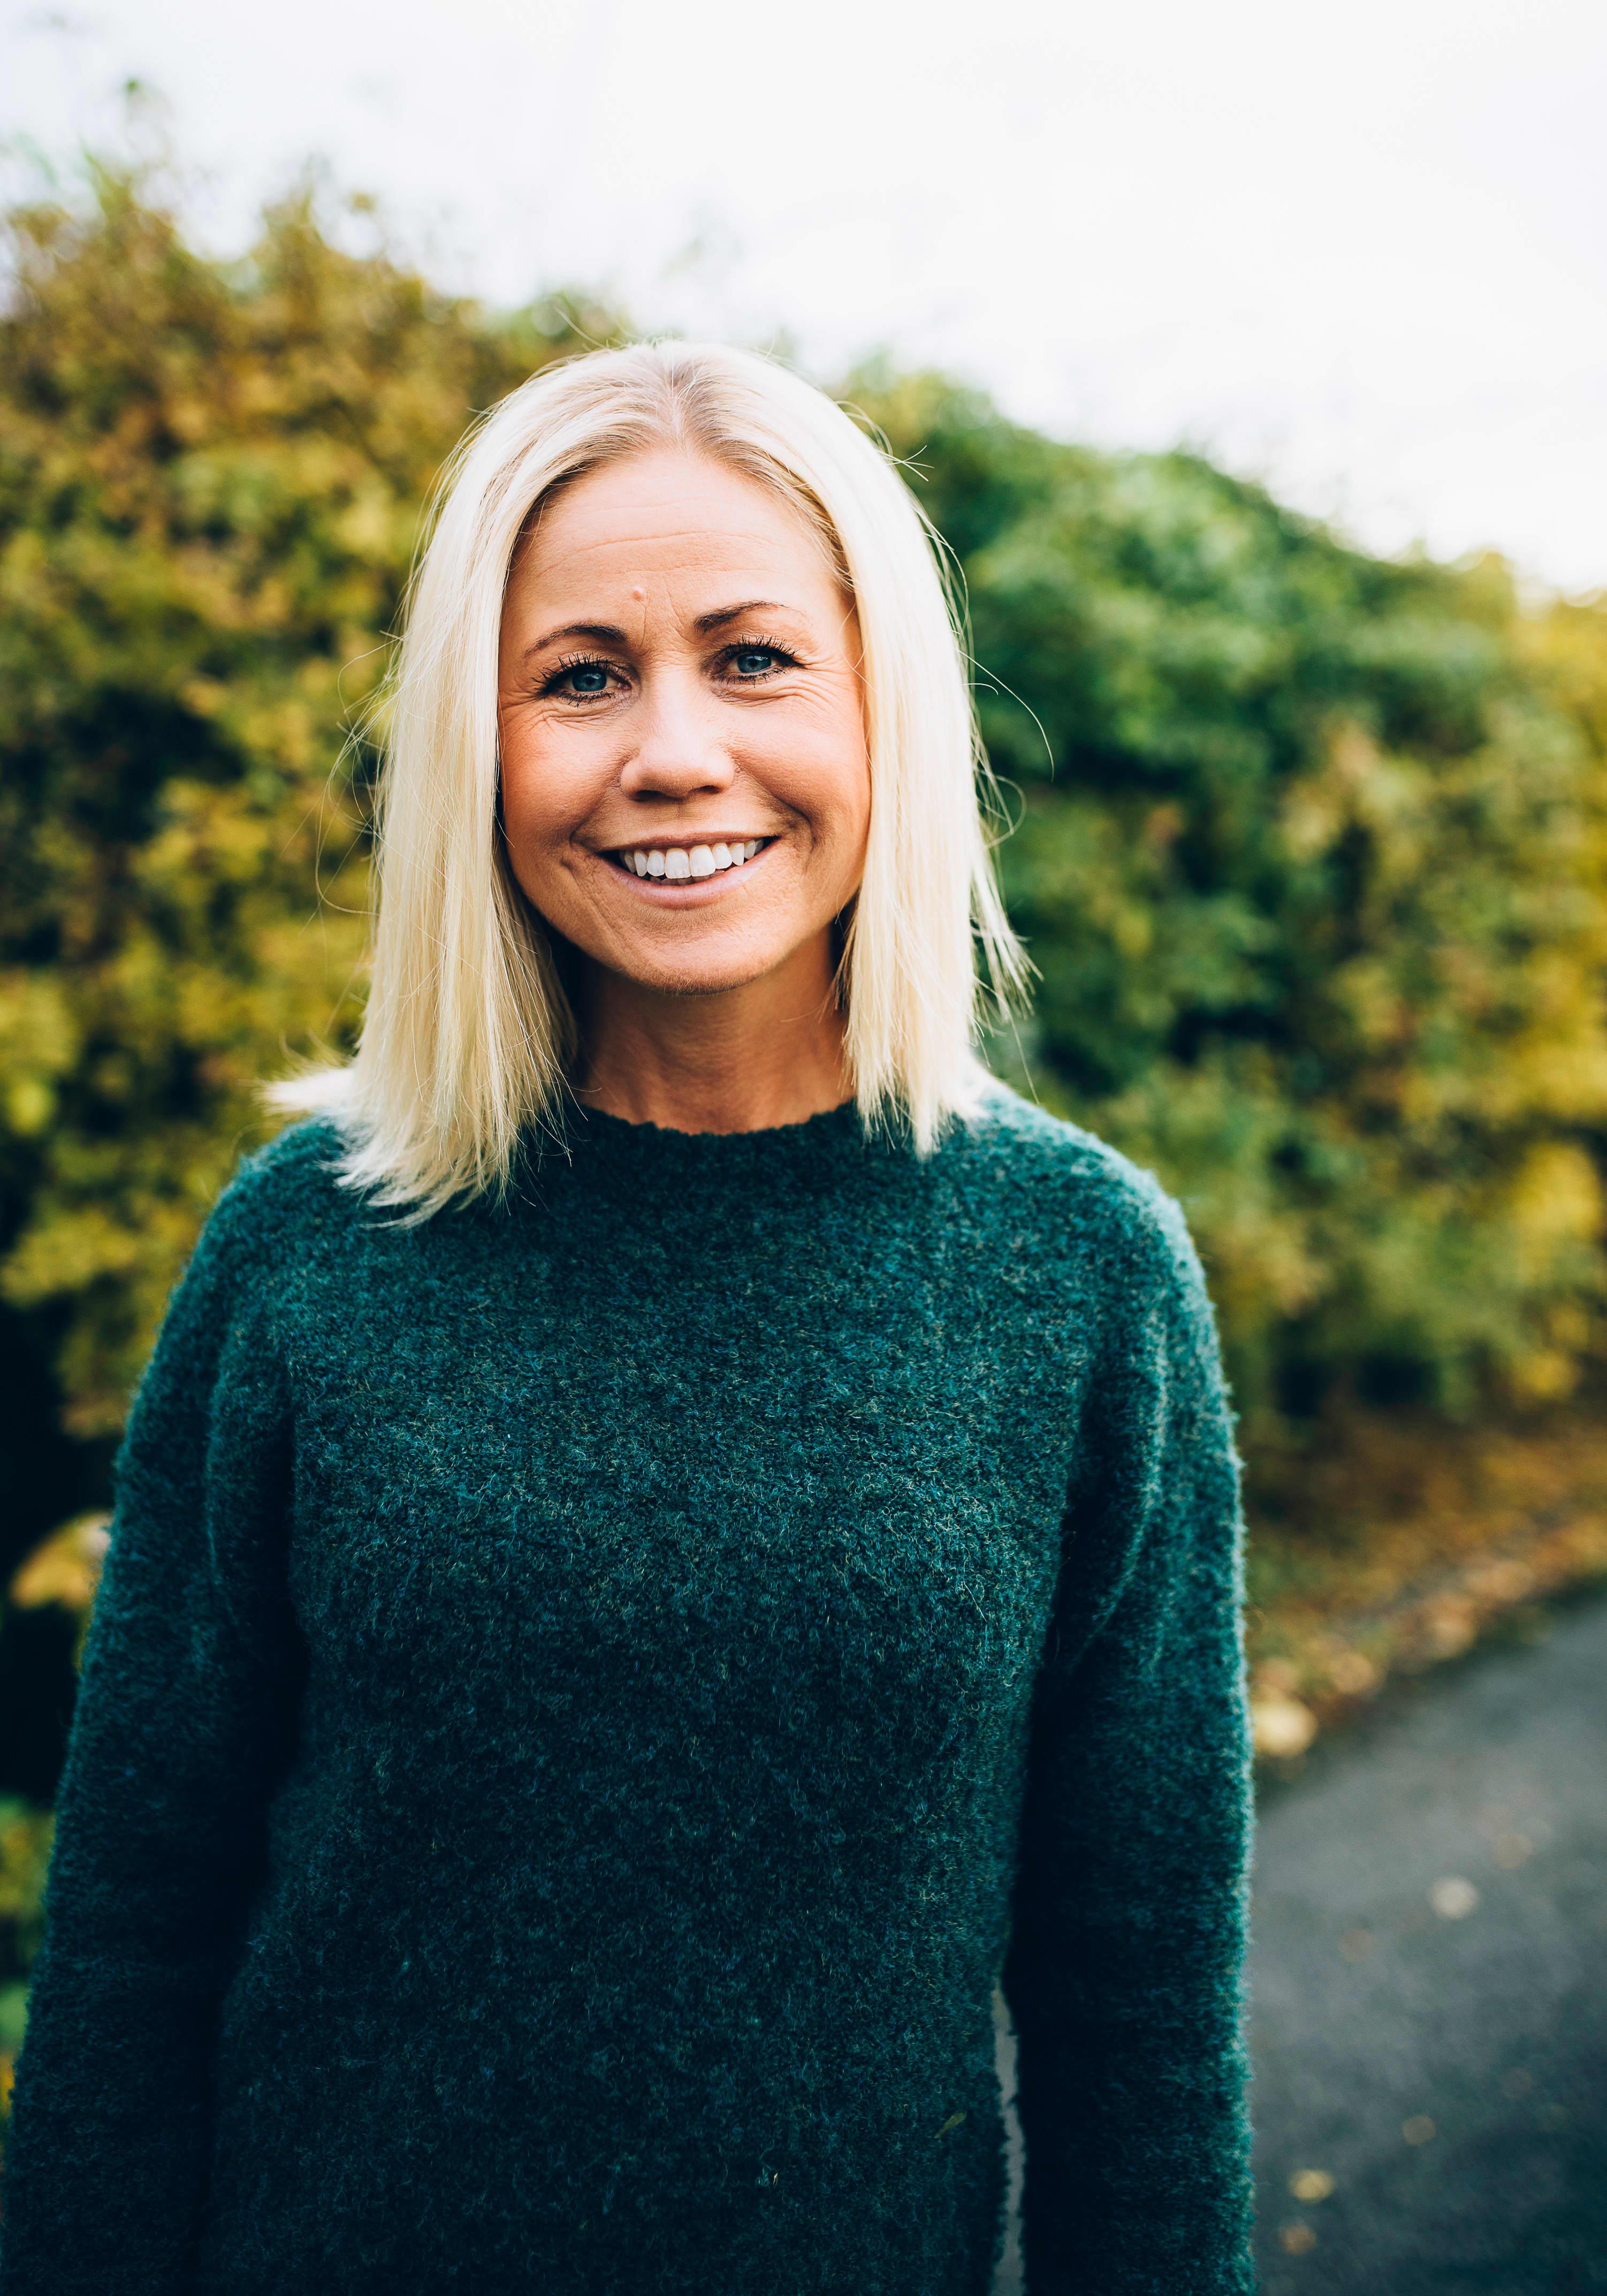 Spis nøtter, sier klinisk ernæringsfysiolog Tine Sundfør.